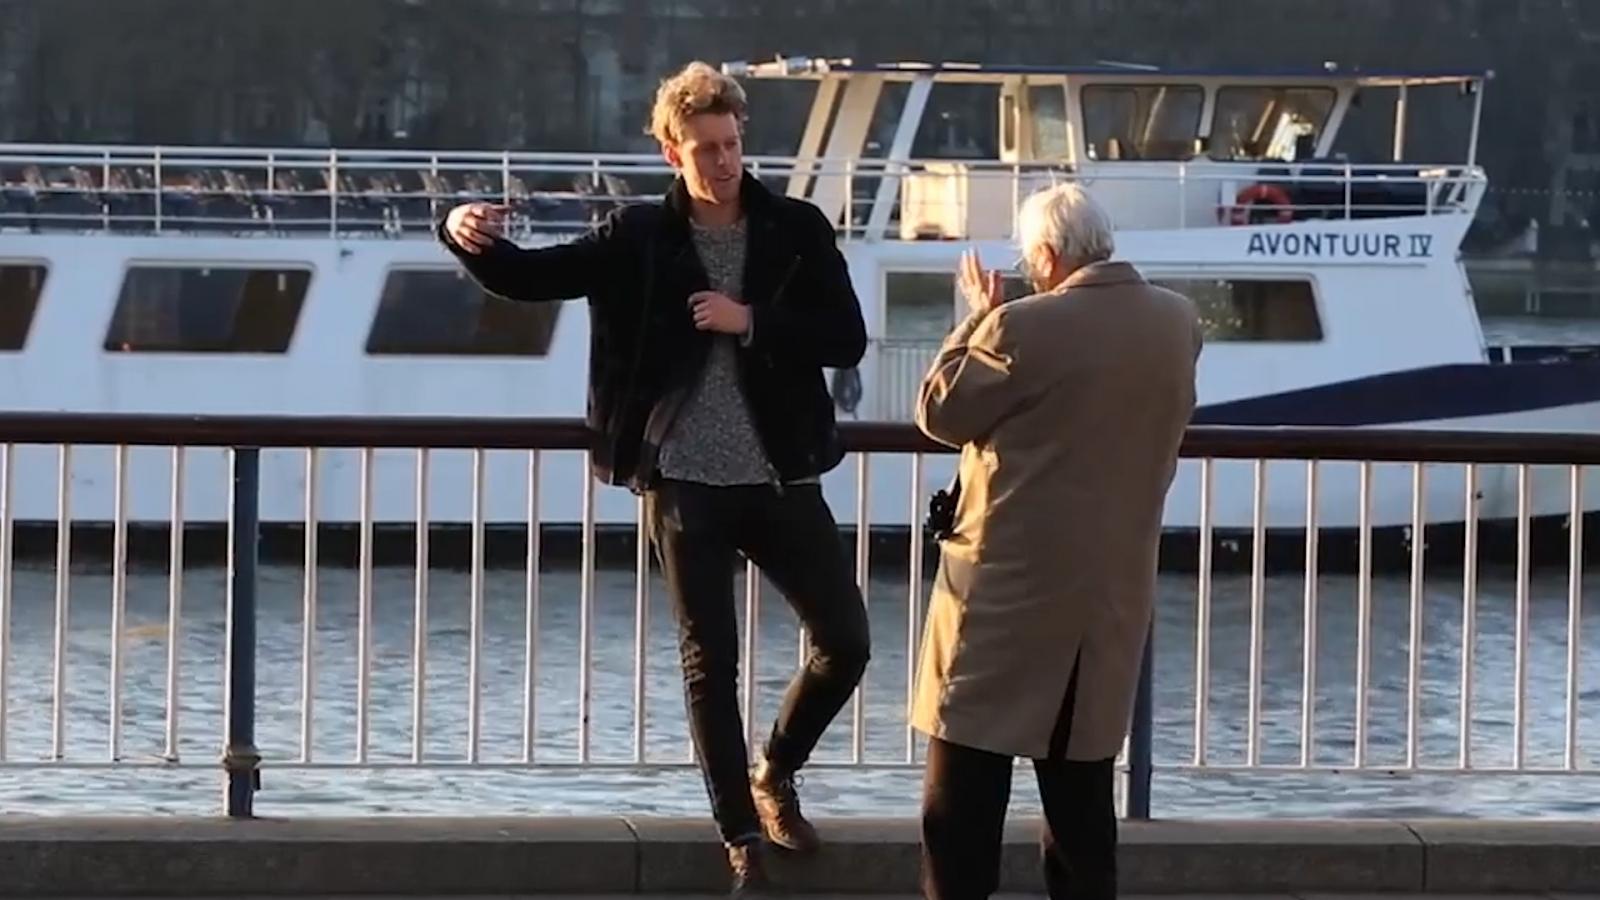 Imaginary friend prank shocks Londoners